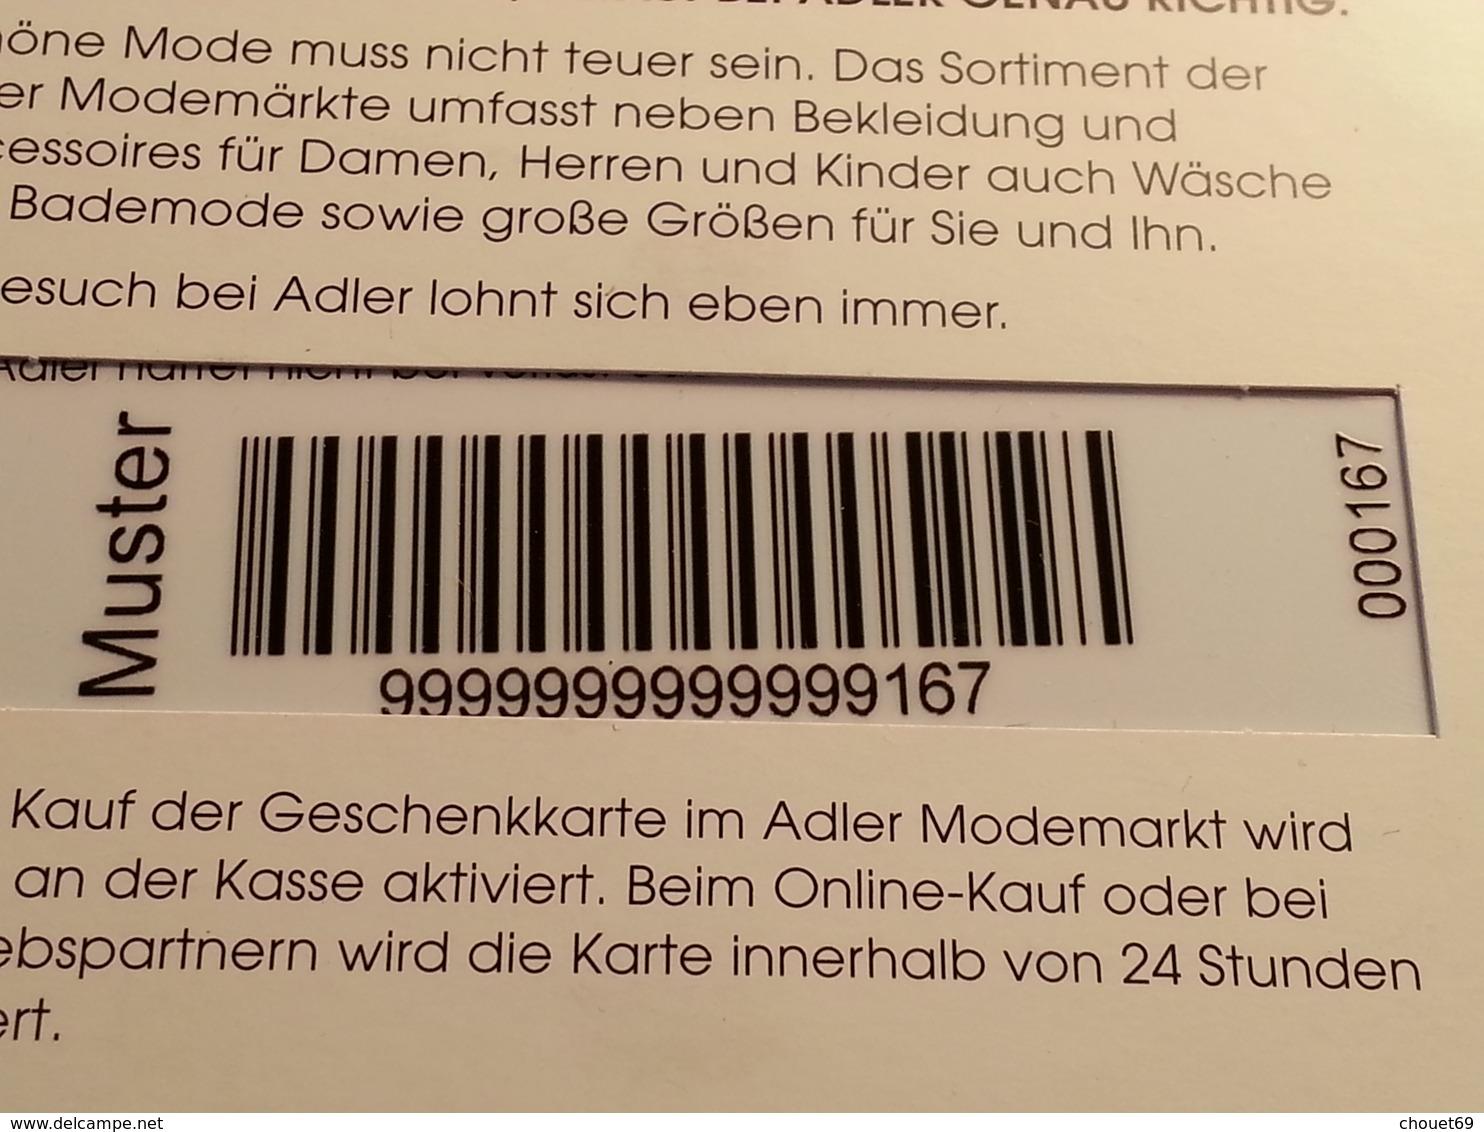 GERMANY - ADLER - MUSTER 25 Euros - DEMO TEST TRIAL CADEAU GIFT CARD (SACROC) - Gift Cards